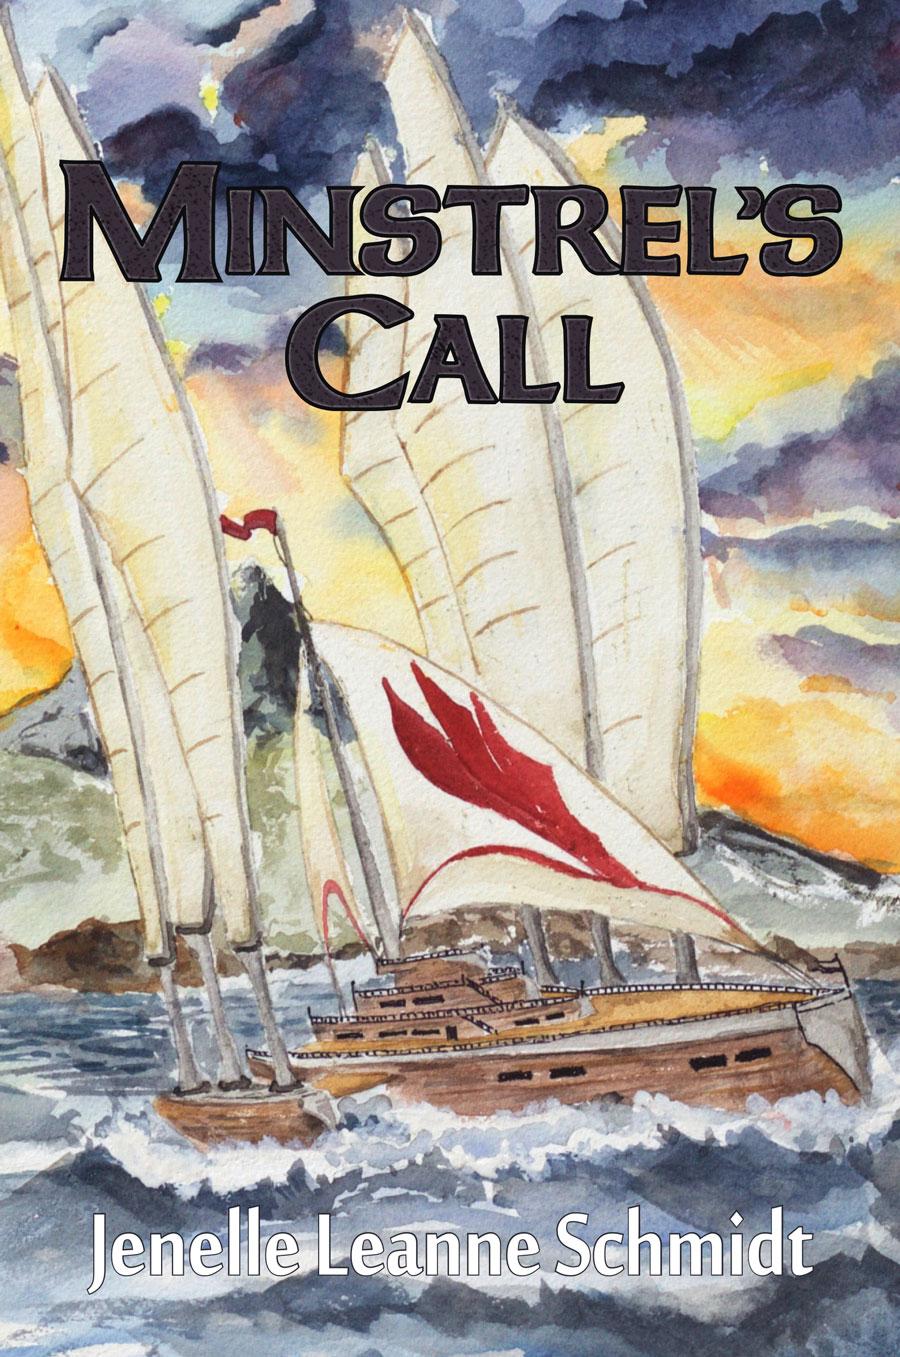 minstrel's call cover for the fantasy novel by Jenelle Schmidt